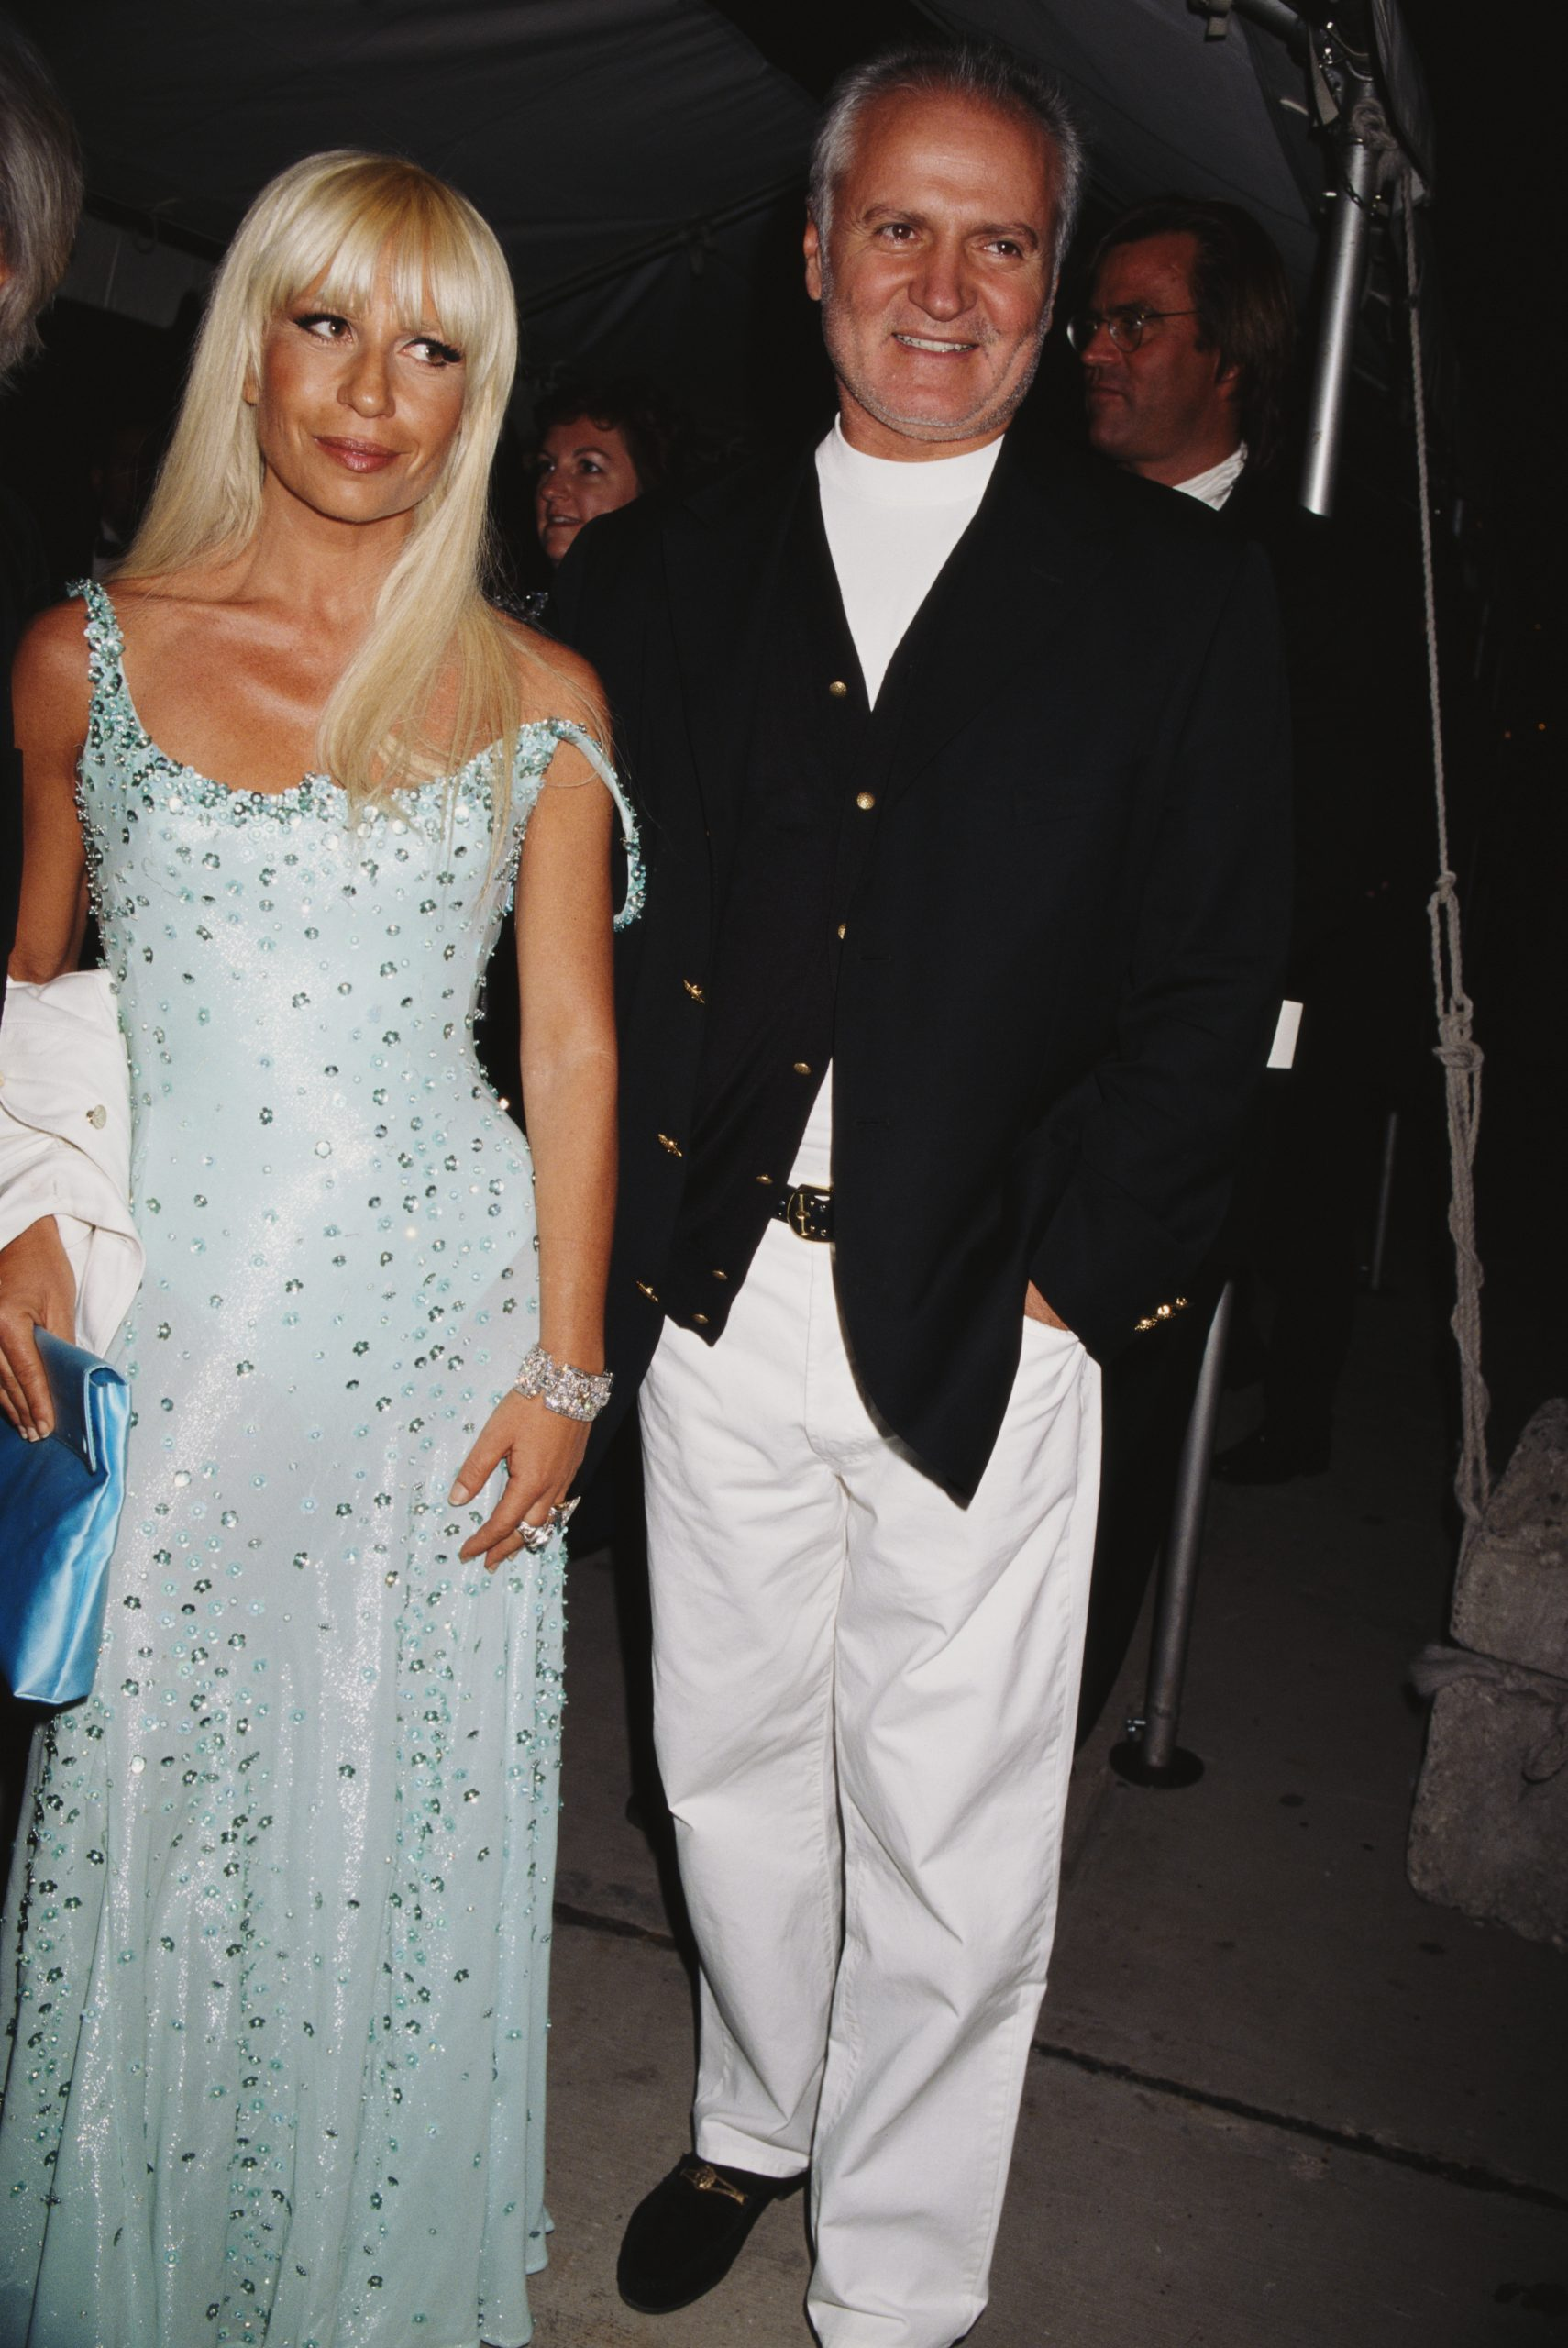 diseñador Gianni Versace